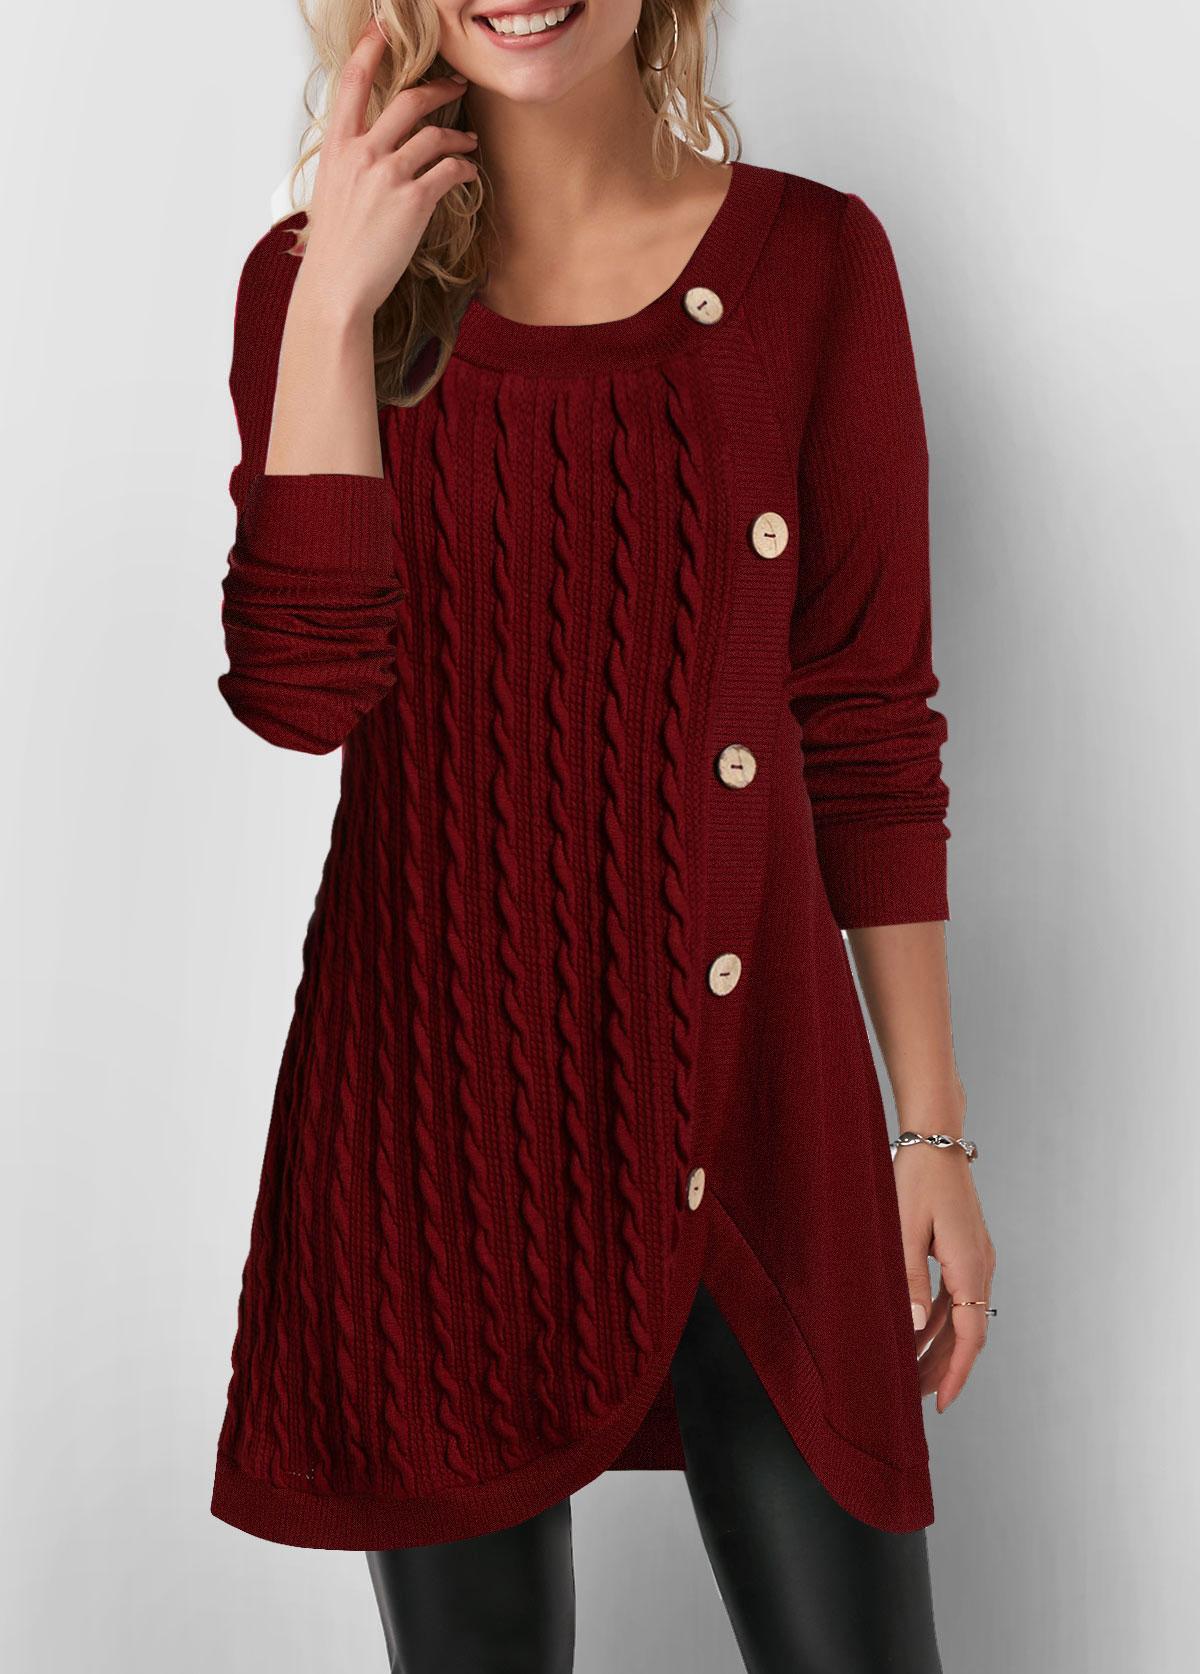 Inclined Button Twist Detail Tulip Hem Sweatshirt